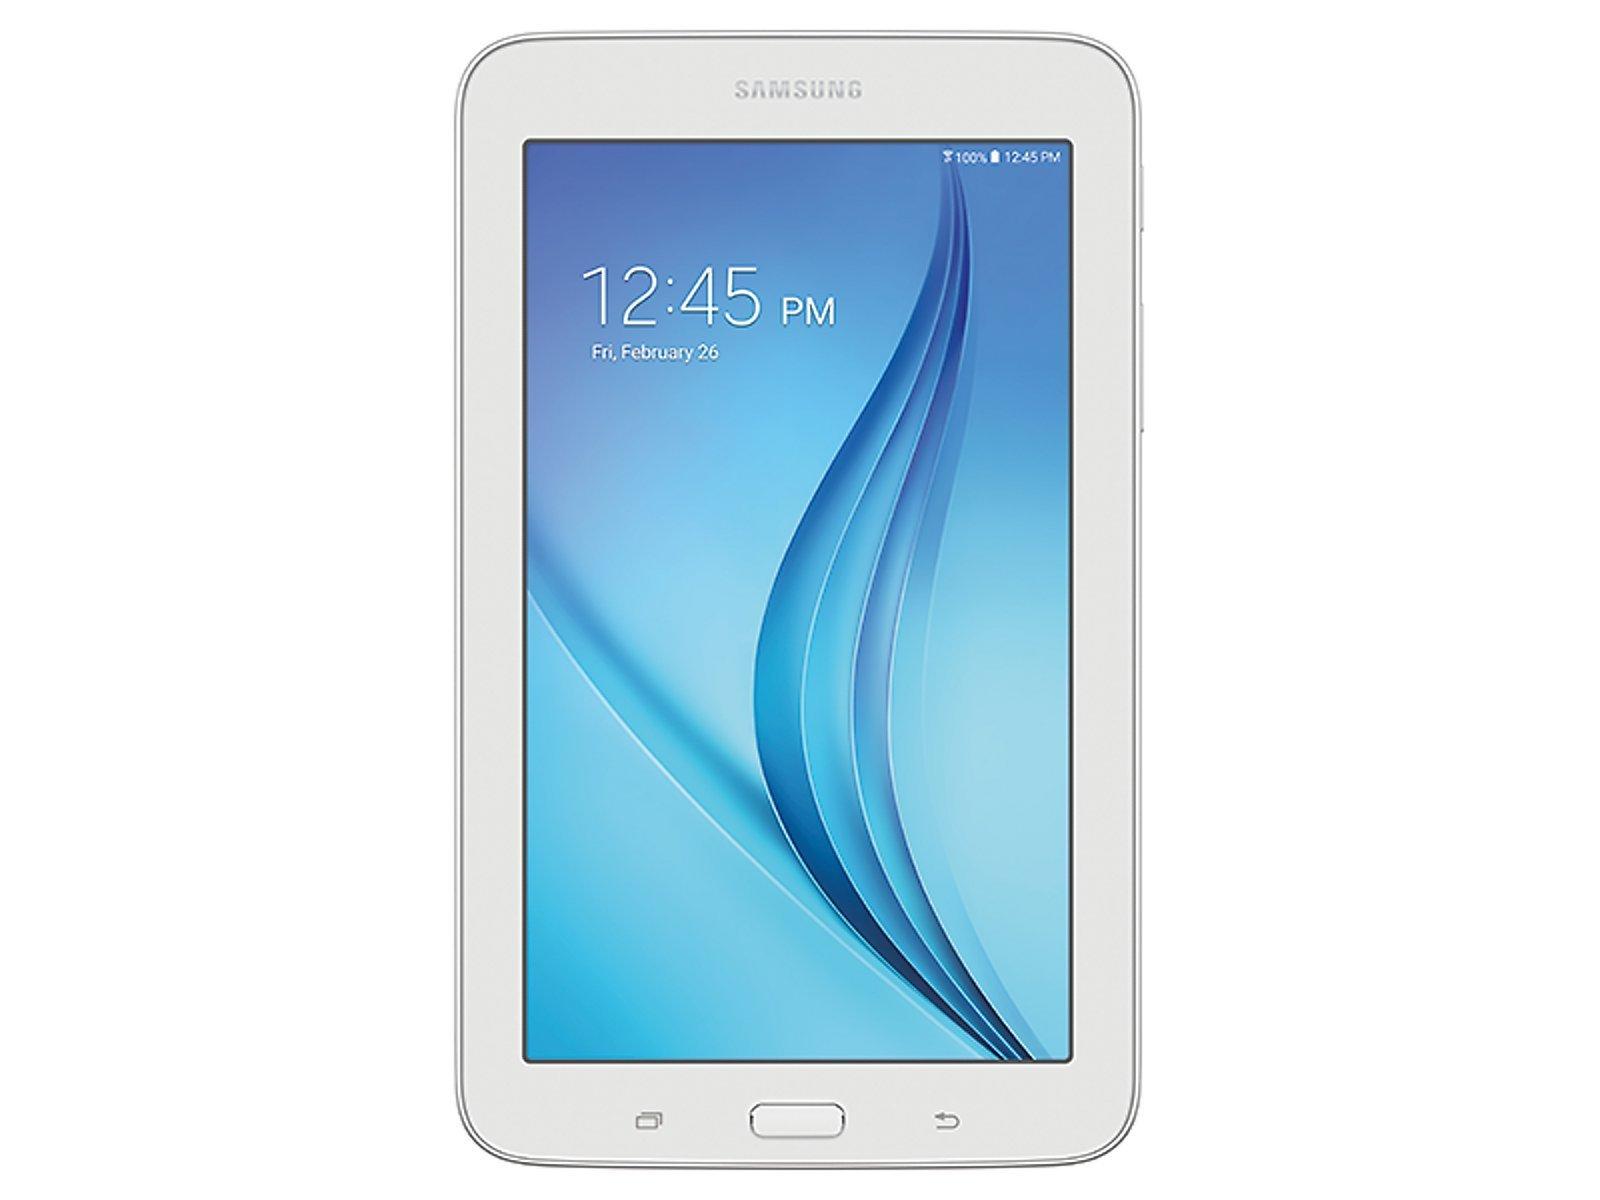 Samsung Galaxy Tab E Lite 7.0'' 8GB Wi-Fi (White) (Certified Refurbished) by Samsung